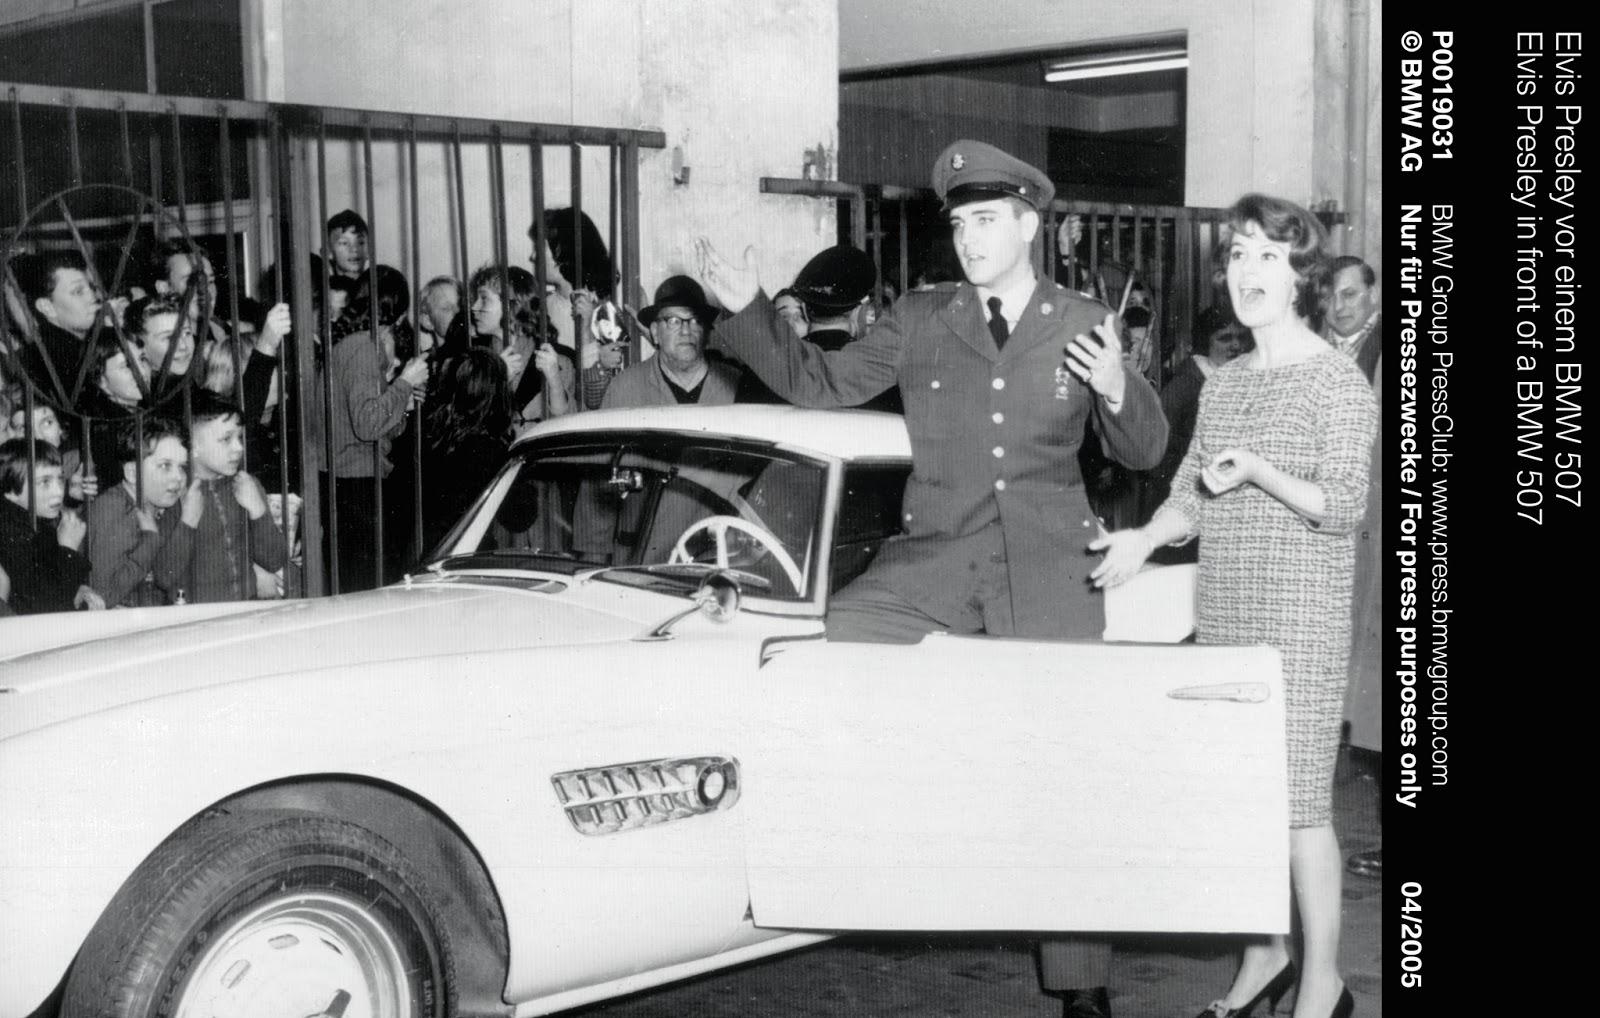 P0019031 1 Η επιστροφή της μυθικής BMW 507 του Elvis στο Concours d'Elegance, Pebble Beach autoshow, BMW, BMW 507, Classic, Concours d'Elegance, Roadster, zblog